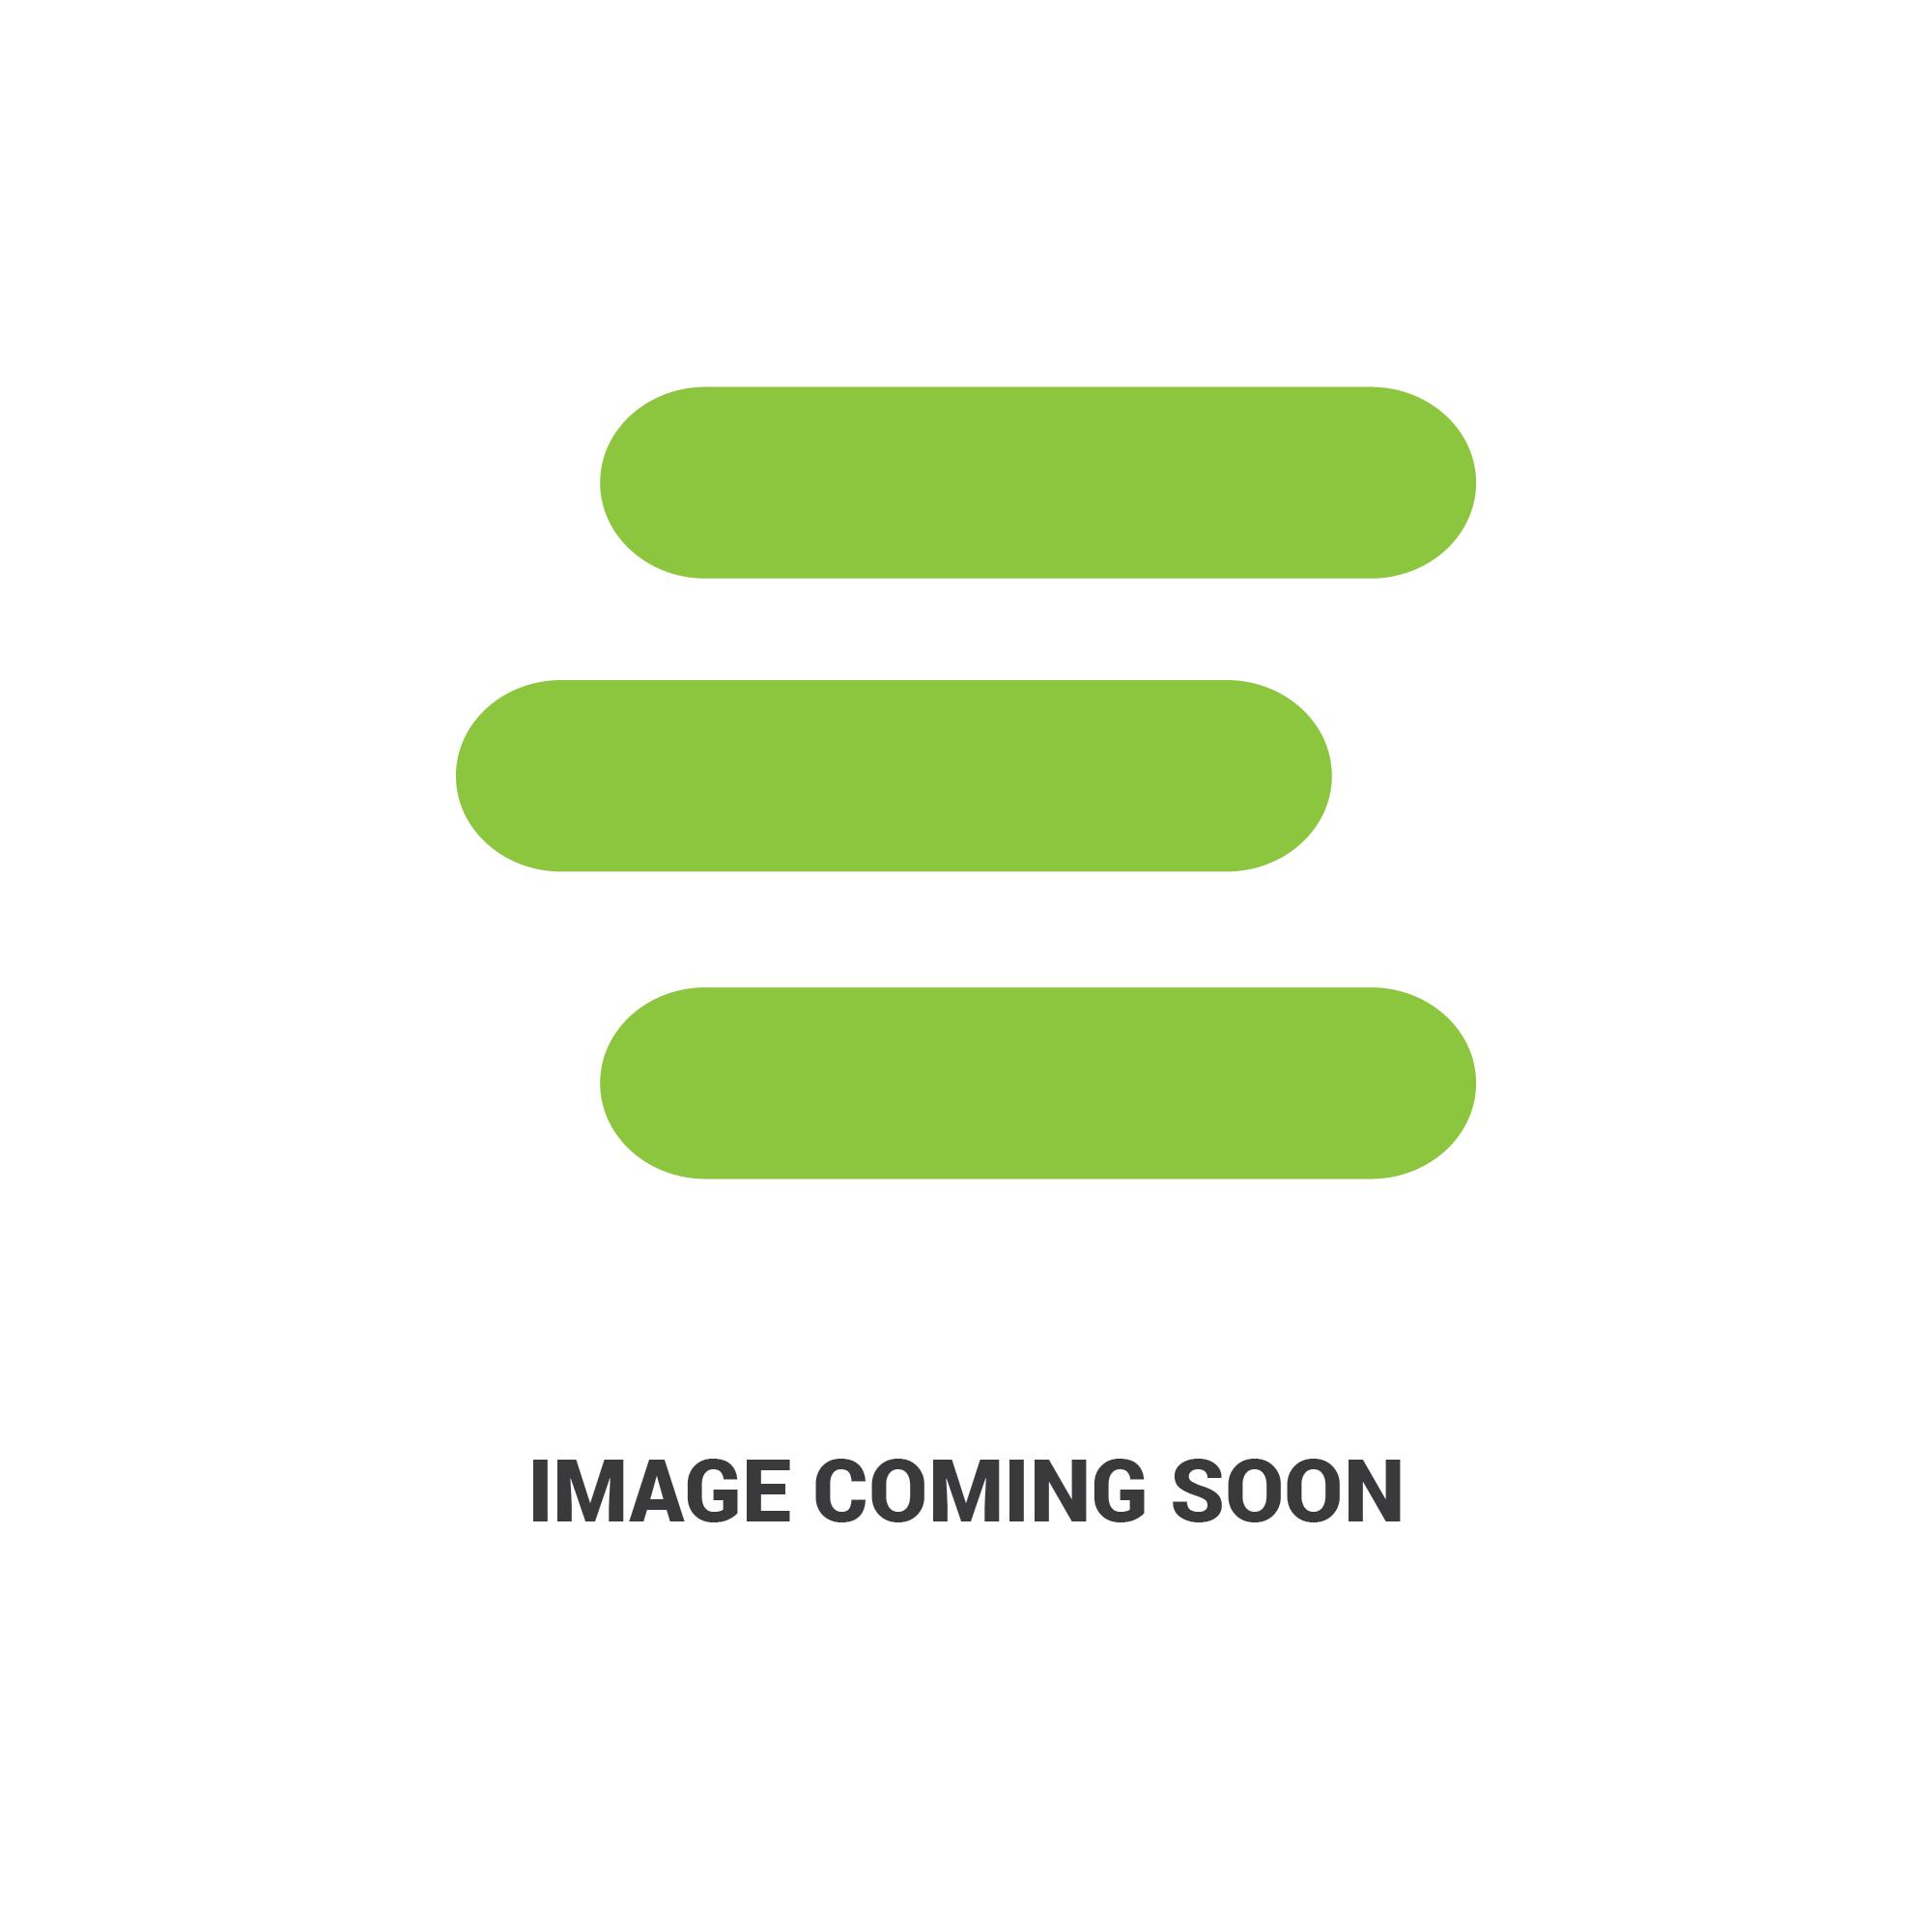 E-66741782554_1 .jpg